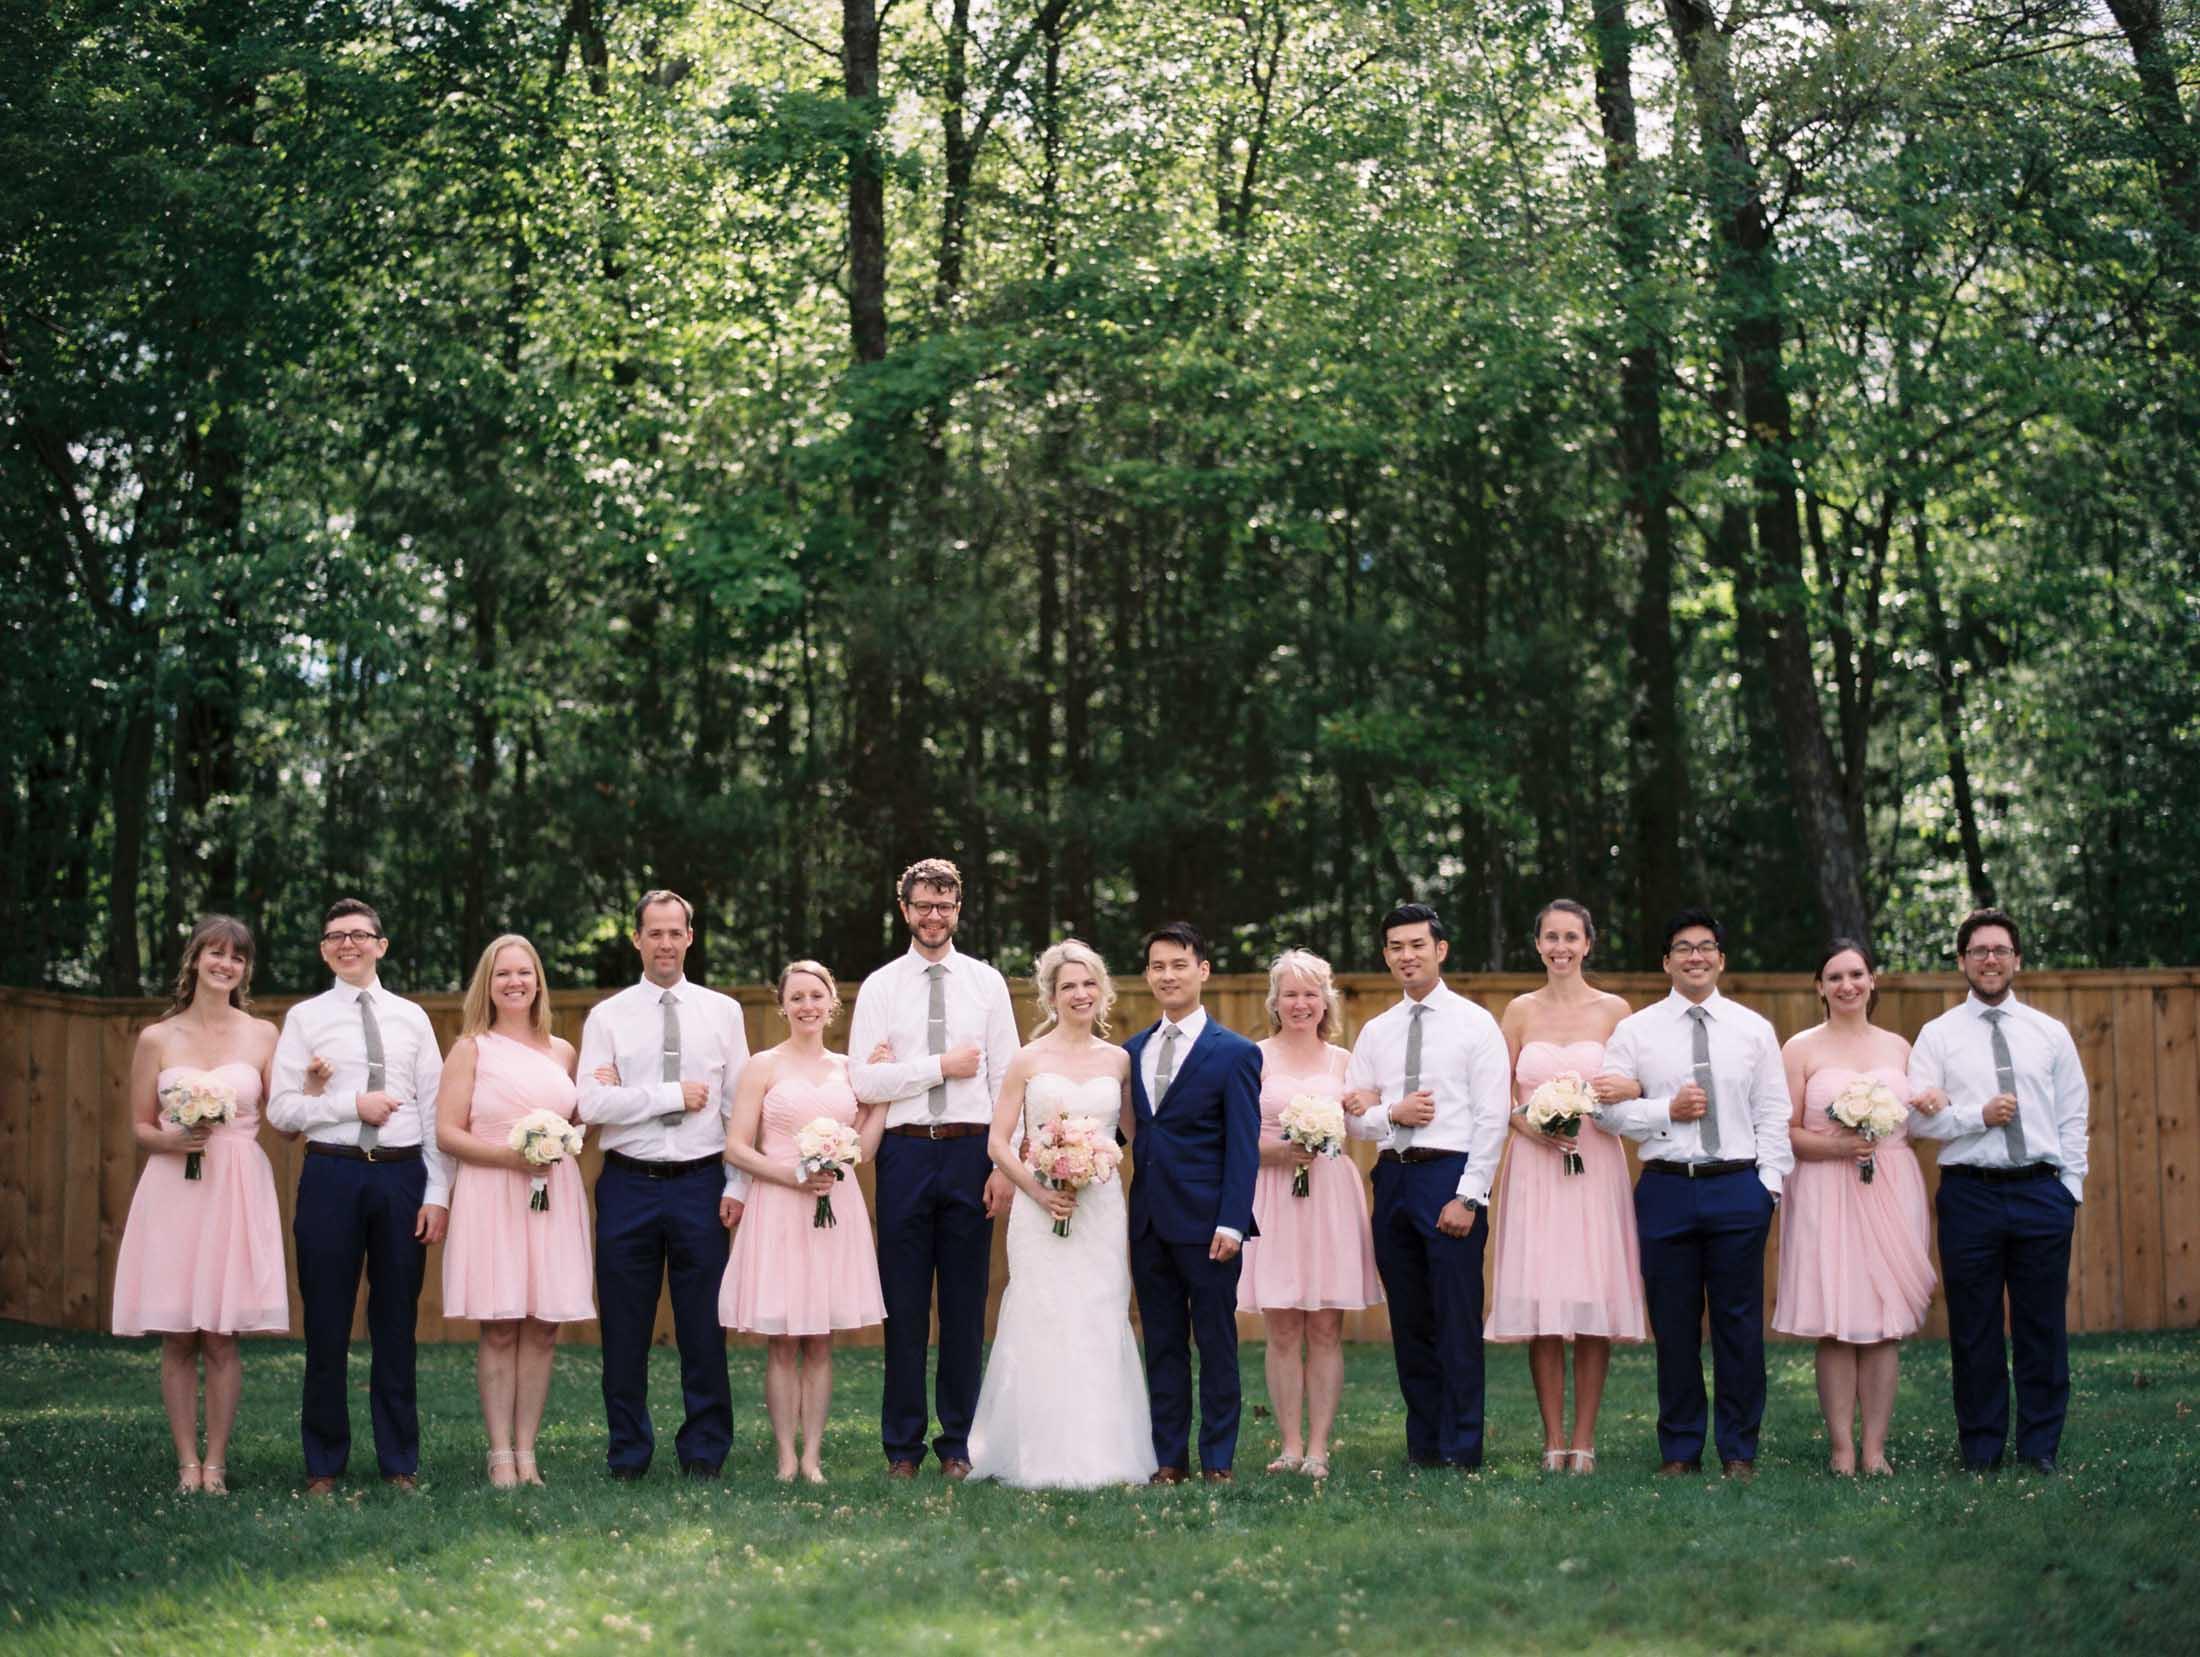 Blissful-Meadows-wedding-11.jpg